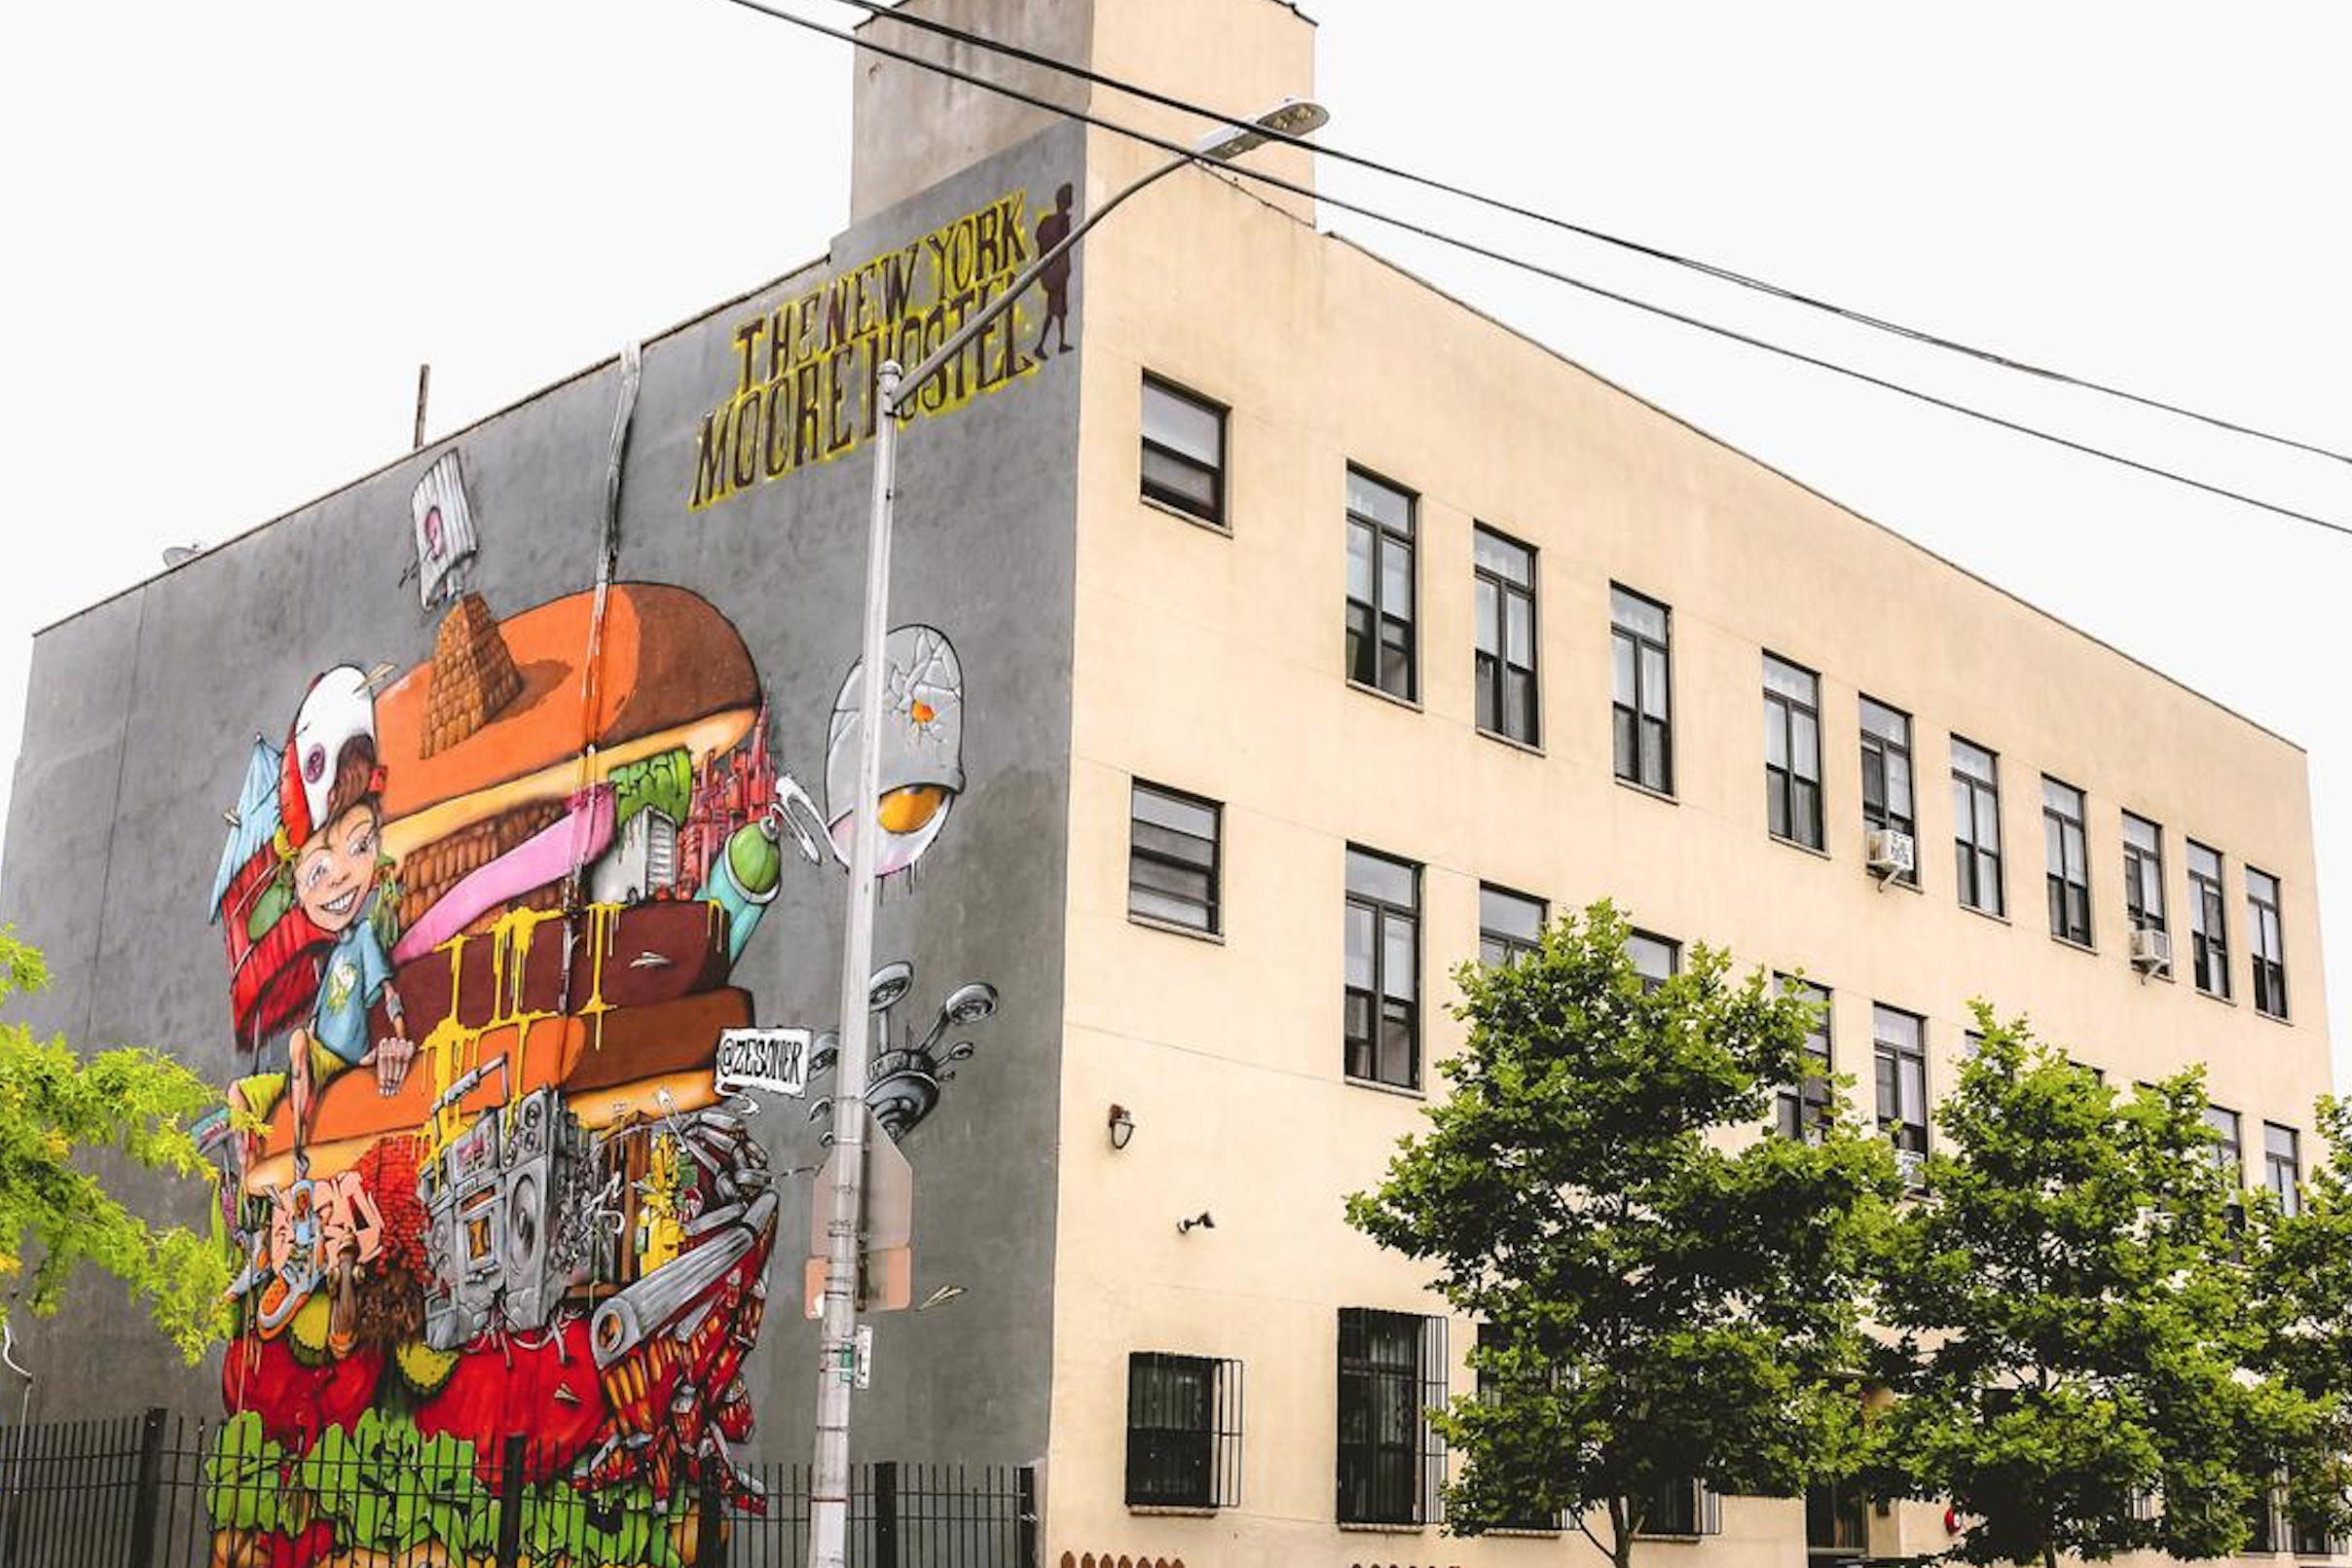 NY Moore Hostel 4.jpg